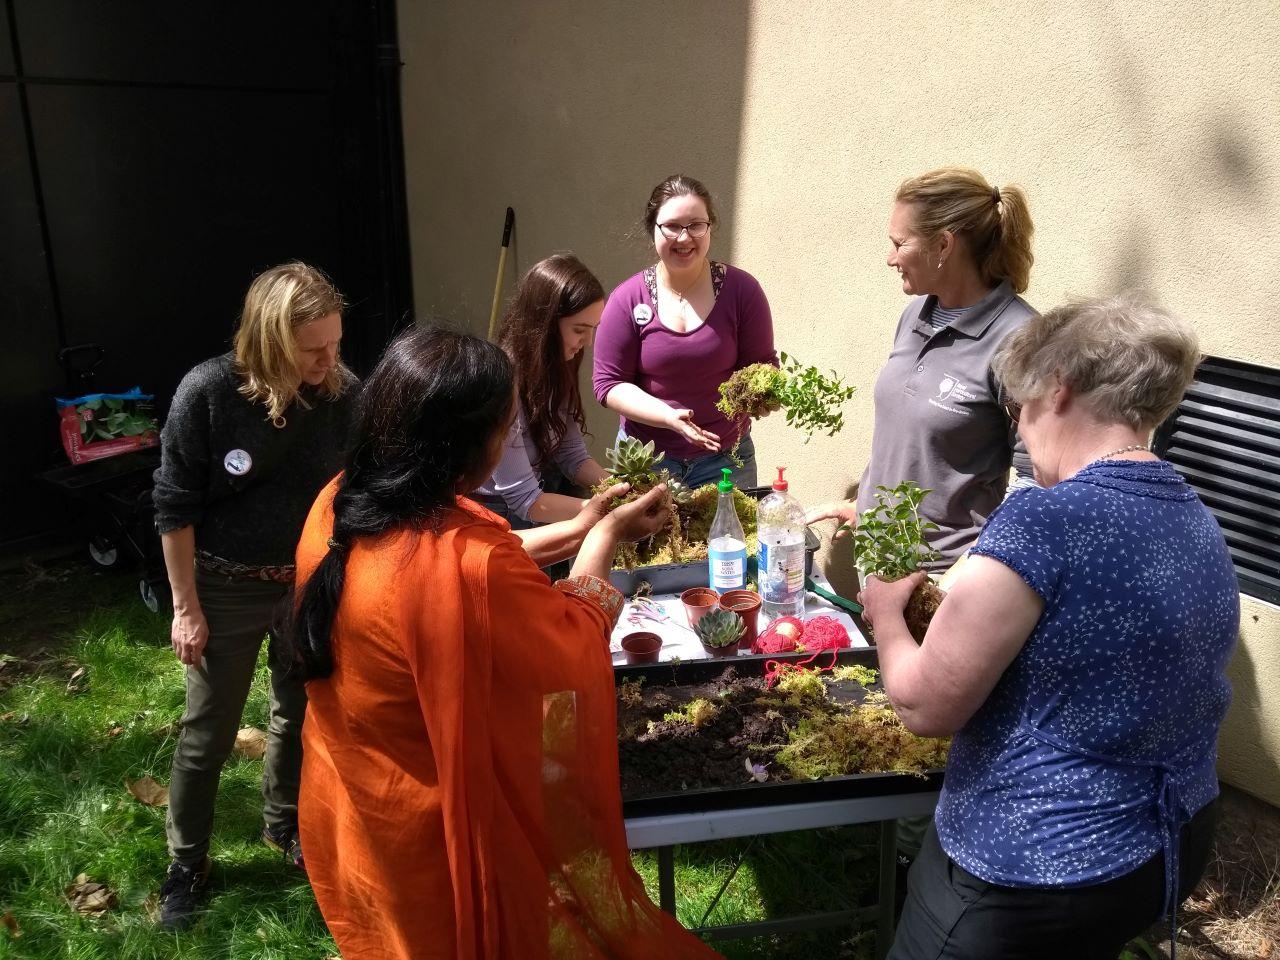 Women from GWL plant a garden outside GWL's building